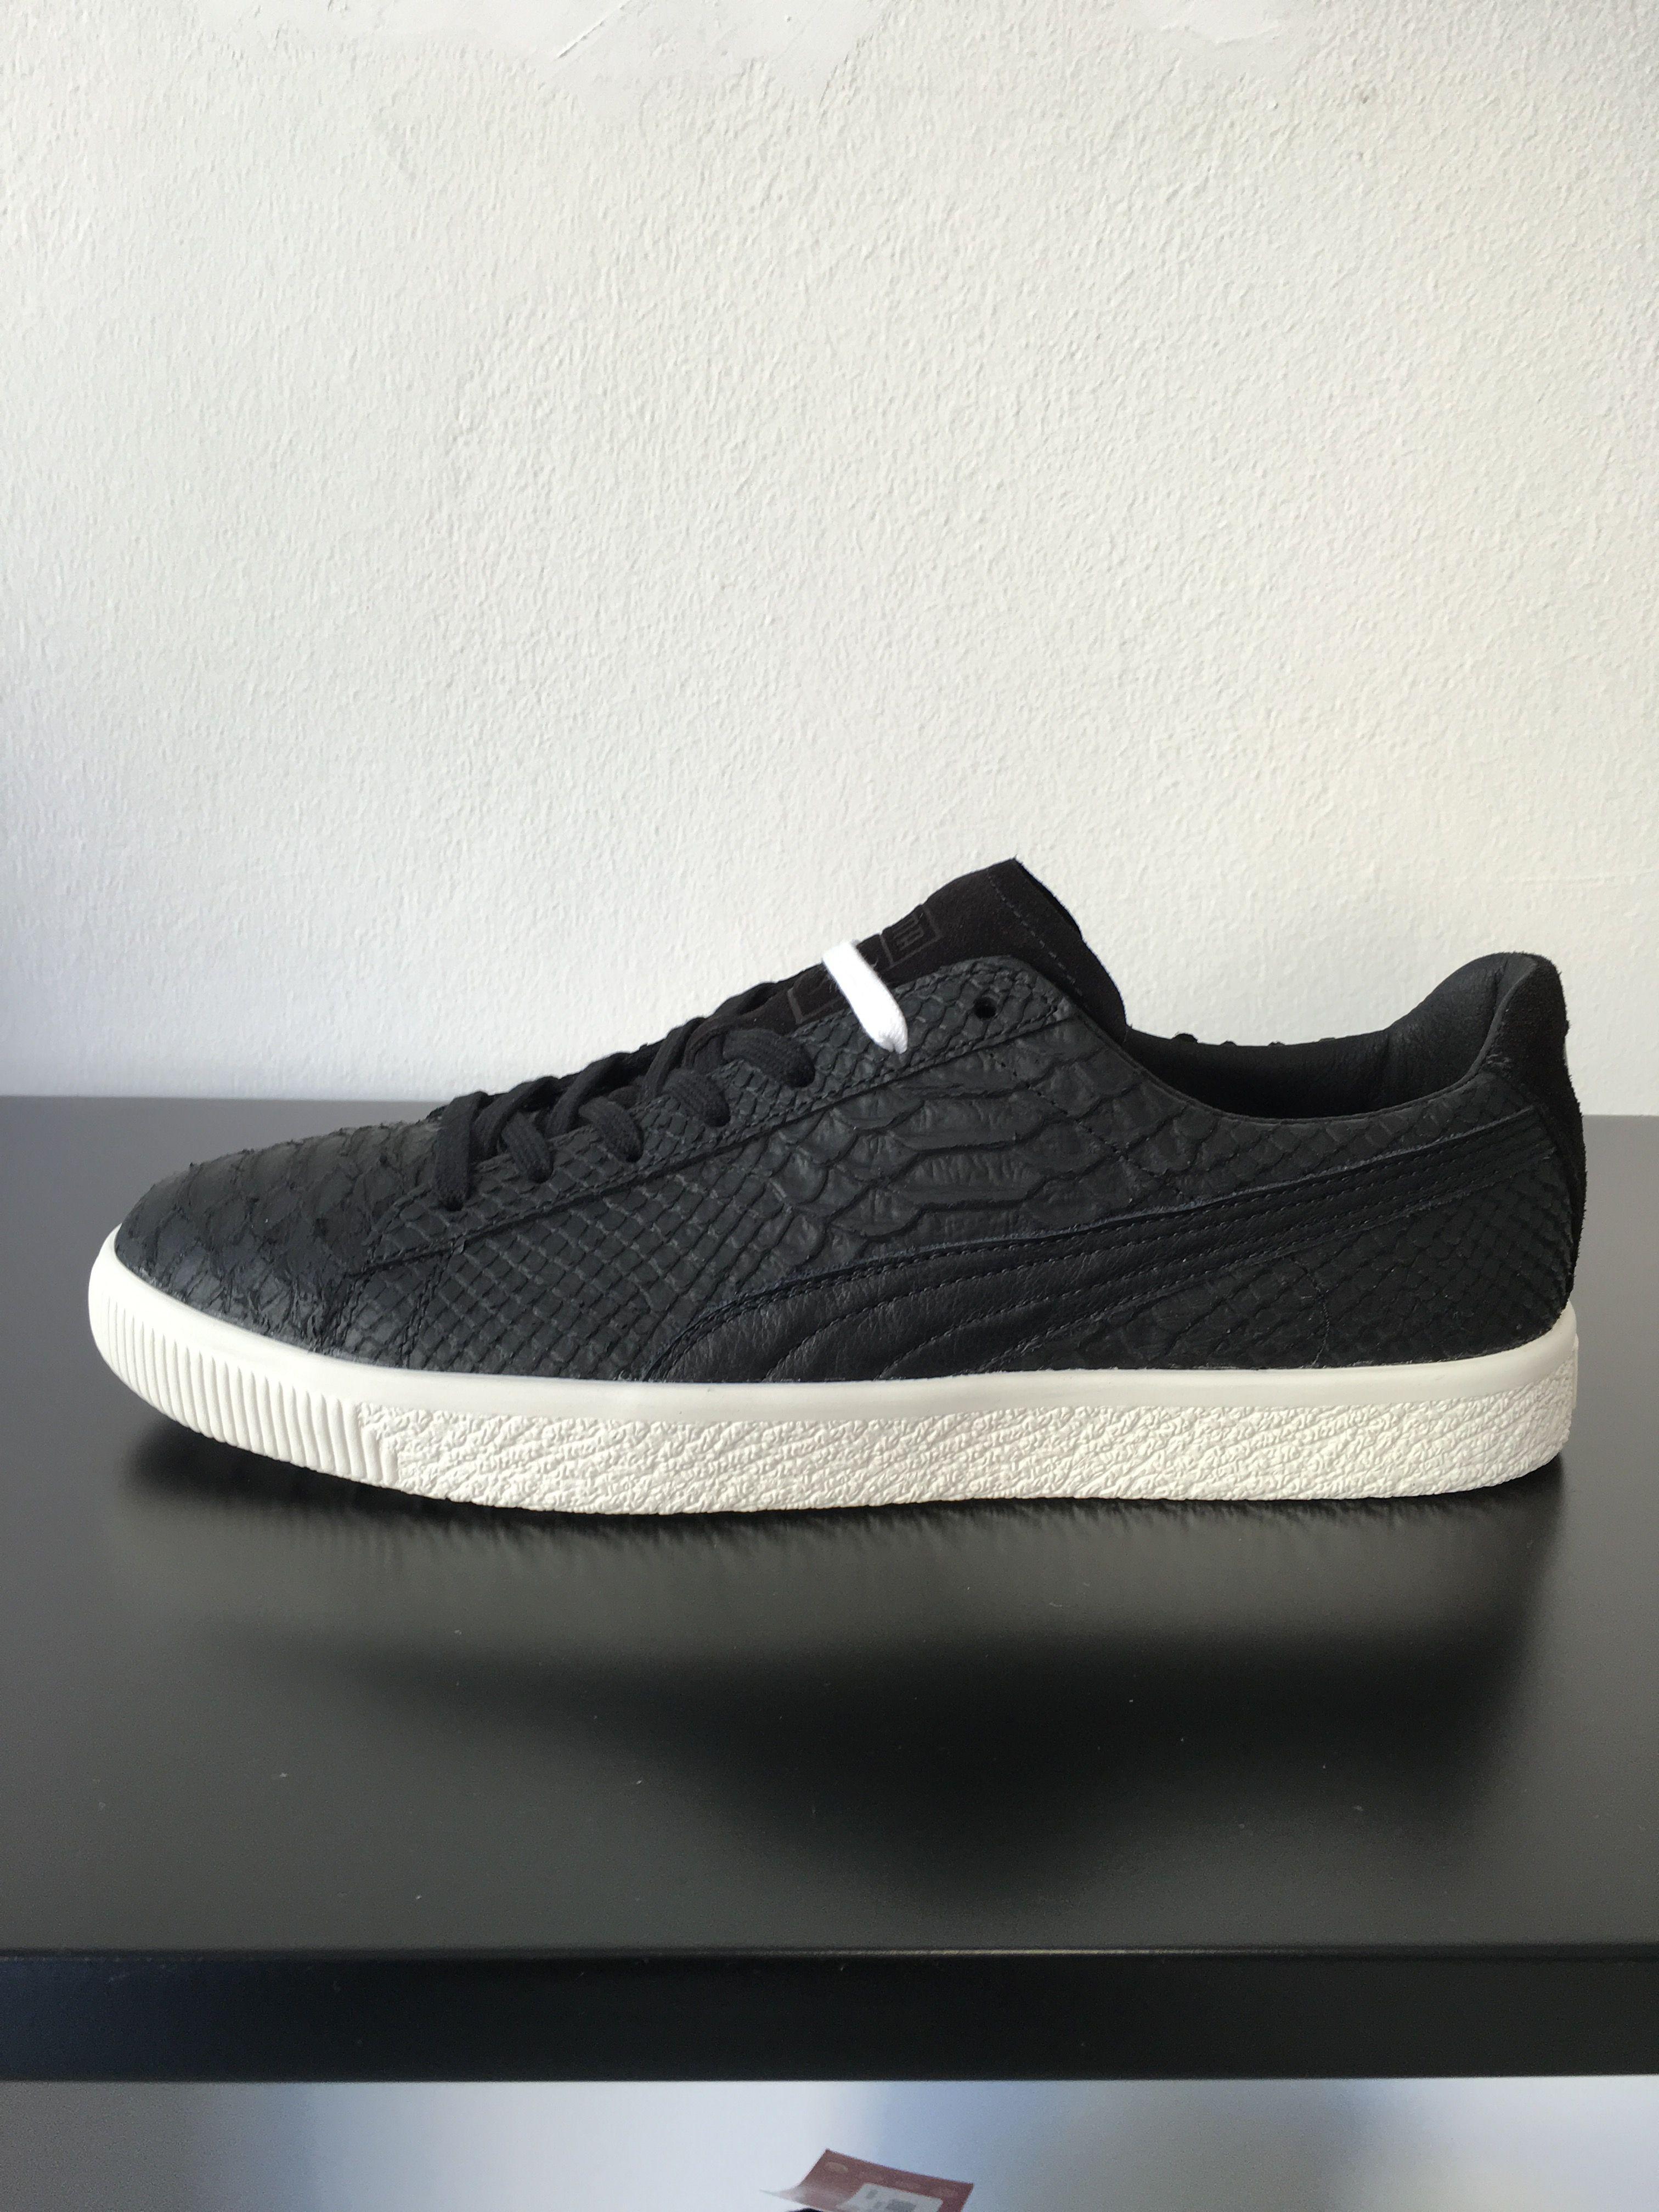 purchase cheap 29ba5 eca9c Puma clyde mii leather black | want list | Puma suede ...